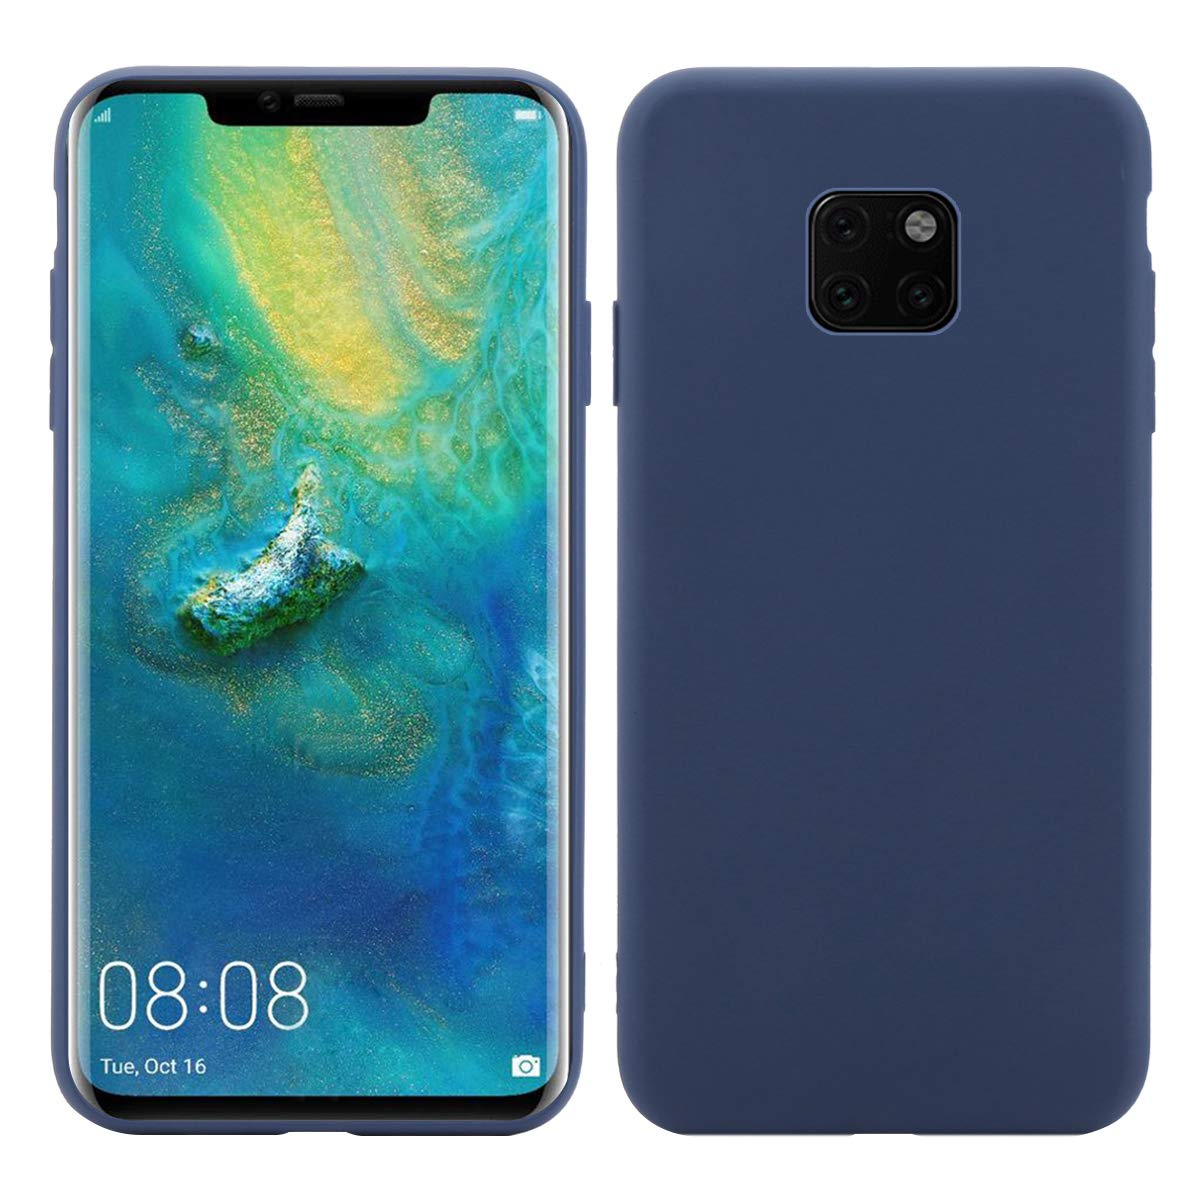 Чехол-накладка Creative Case для Huawei Mate 20 силикон/искусственная кожа (синий) фото